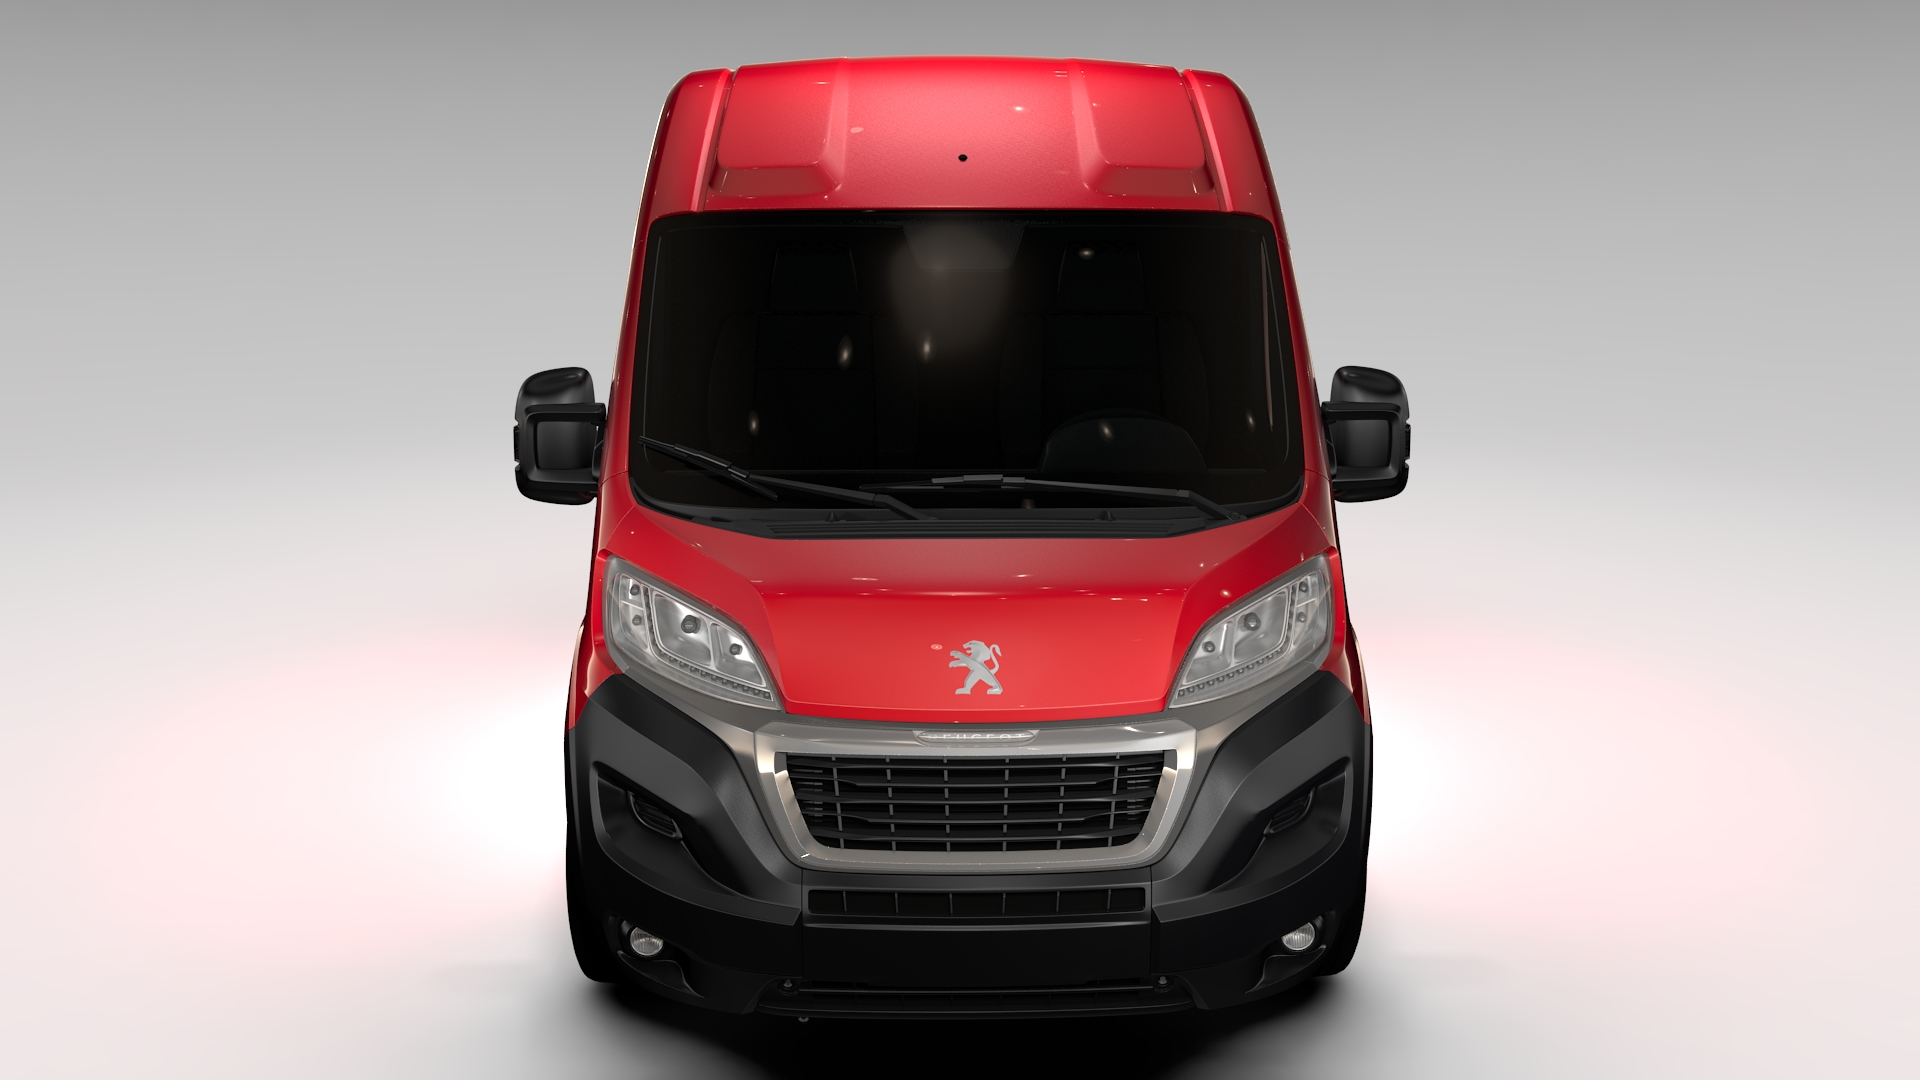 Peugeot boxer van l1h2 2017 3d líkan 3ds hámark fbx c4d lwo ma mb hrc xsi obj 222237